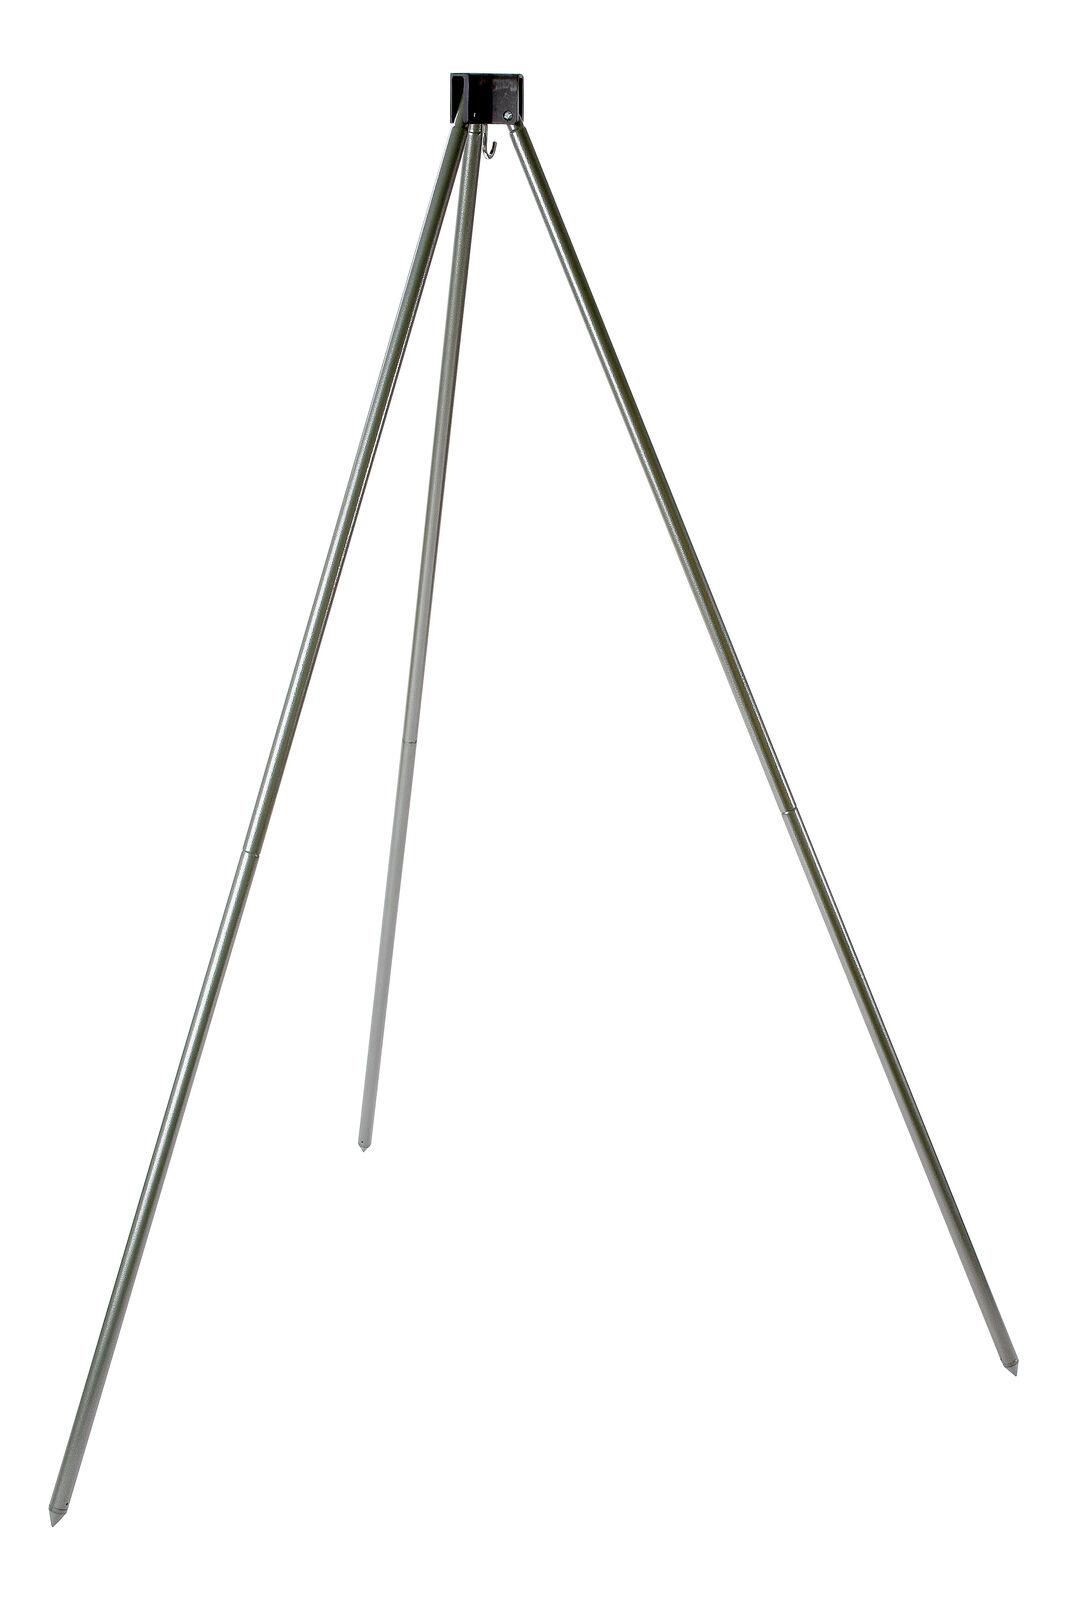 Ny Daiwa Infinity Weigh Pod Modell nr. IWP1